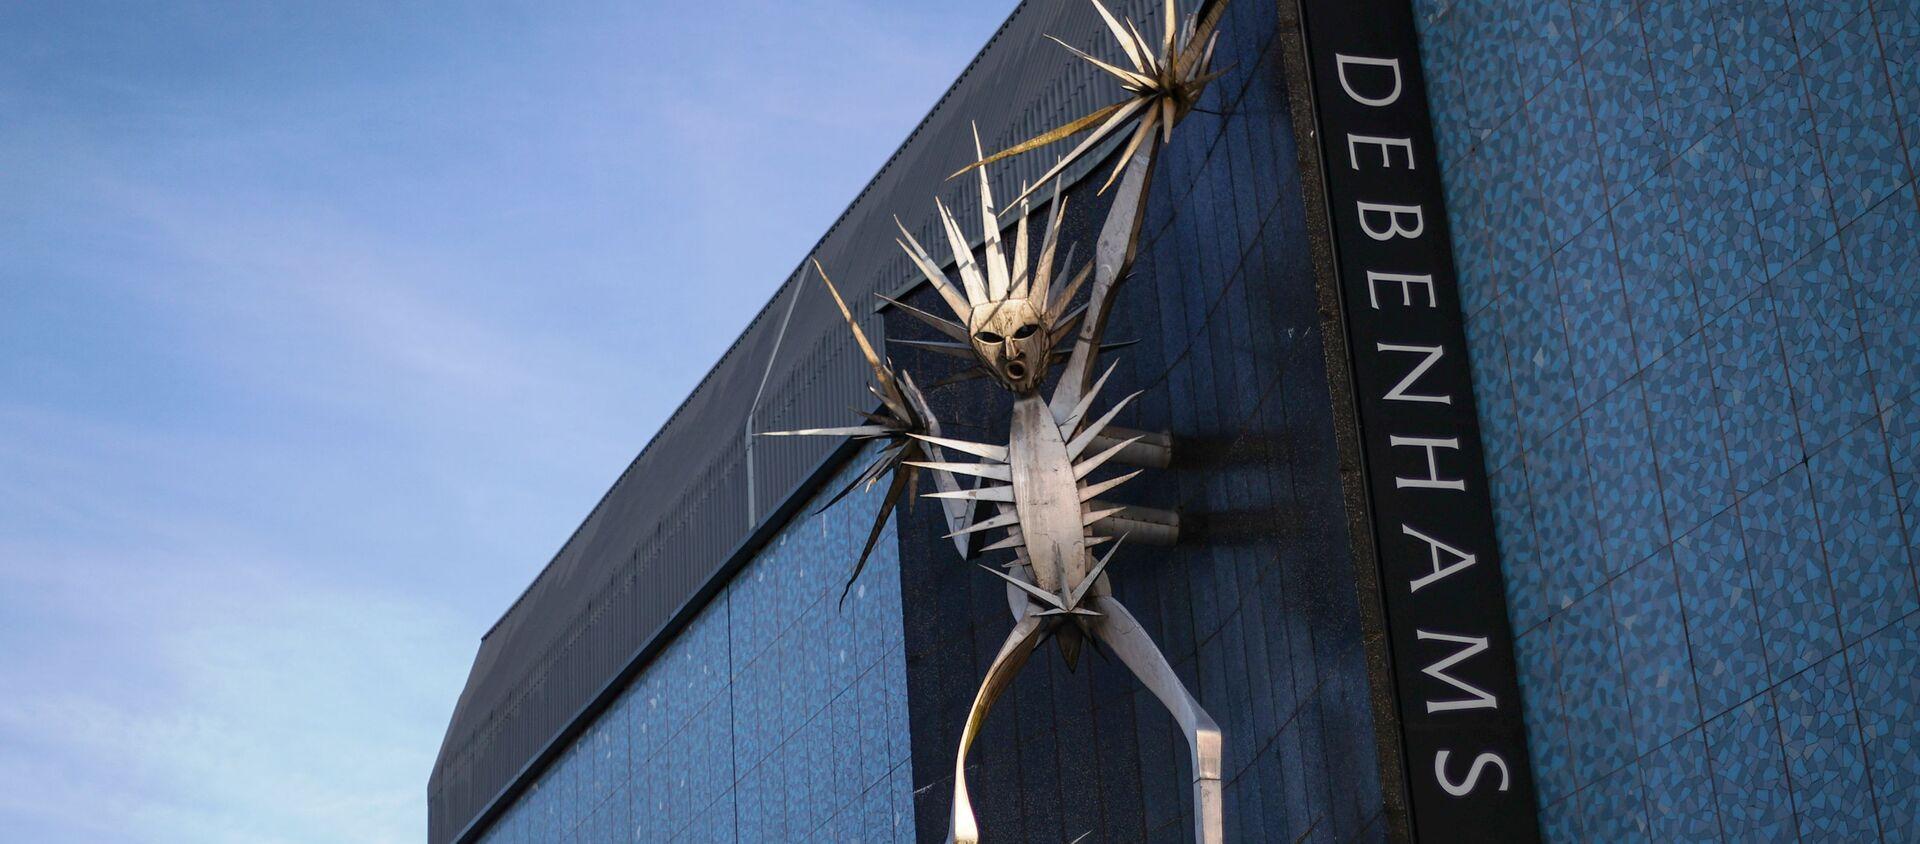 A sculpture on Debenhams' building is seen amidst the outbreak of the coronavirus disease (COVID-19), in Hanley, Stoke-on-Trent, Britain December 1, 2020. - Sputnik International, 1920, 01.12.2020